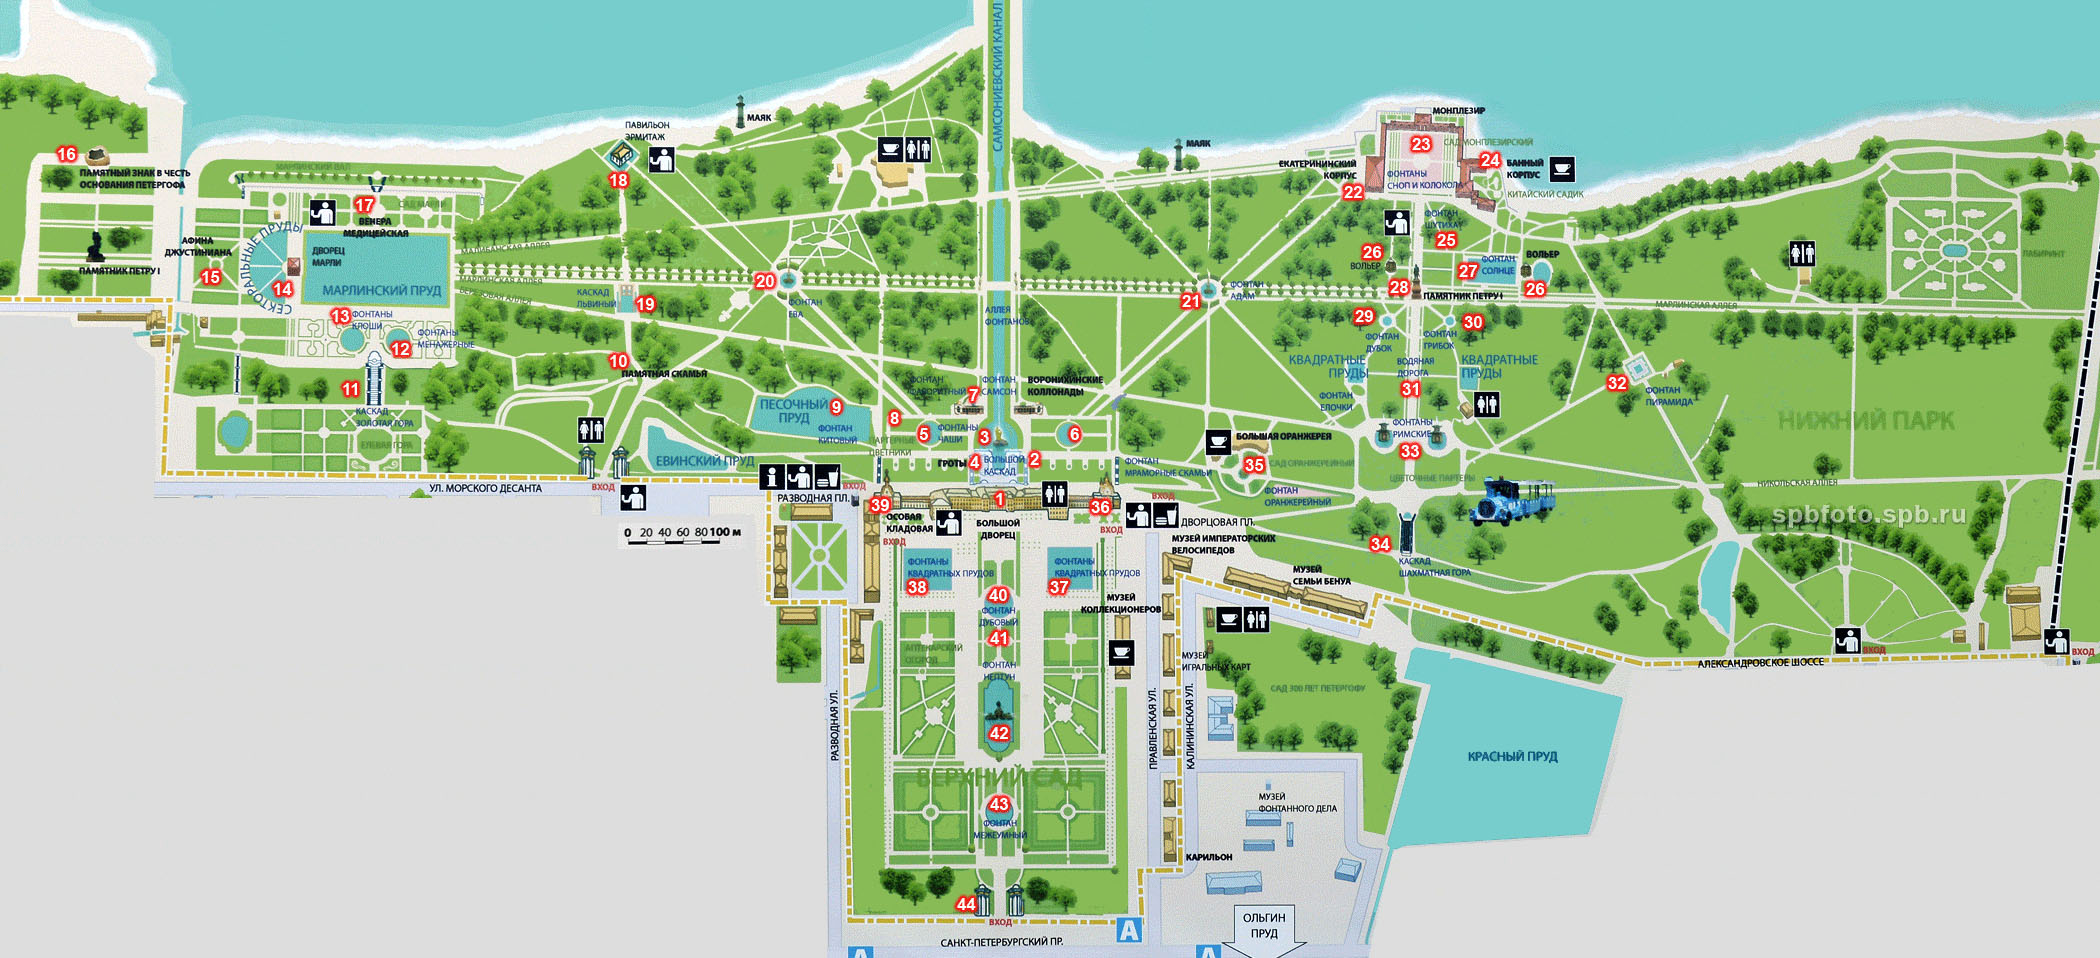 Петергоф схема парка лабиринт